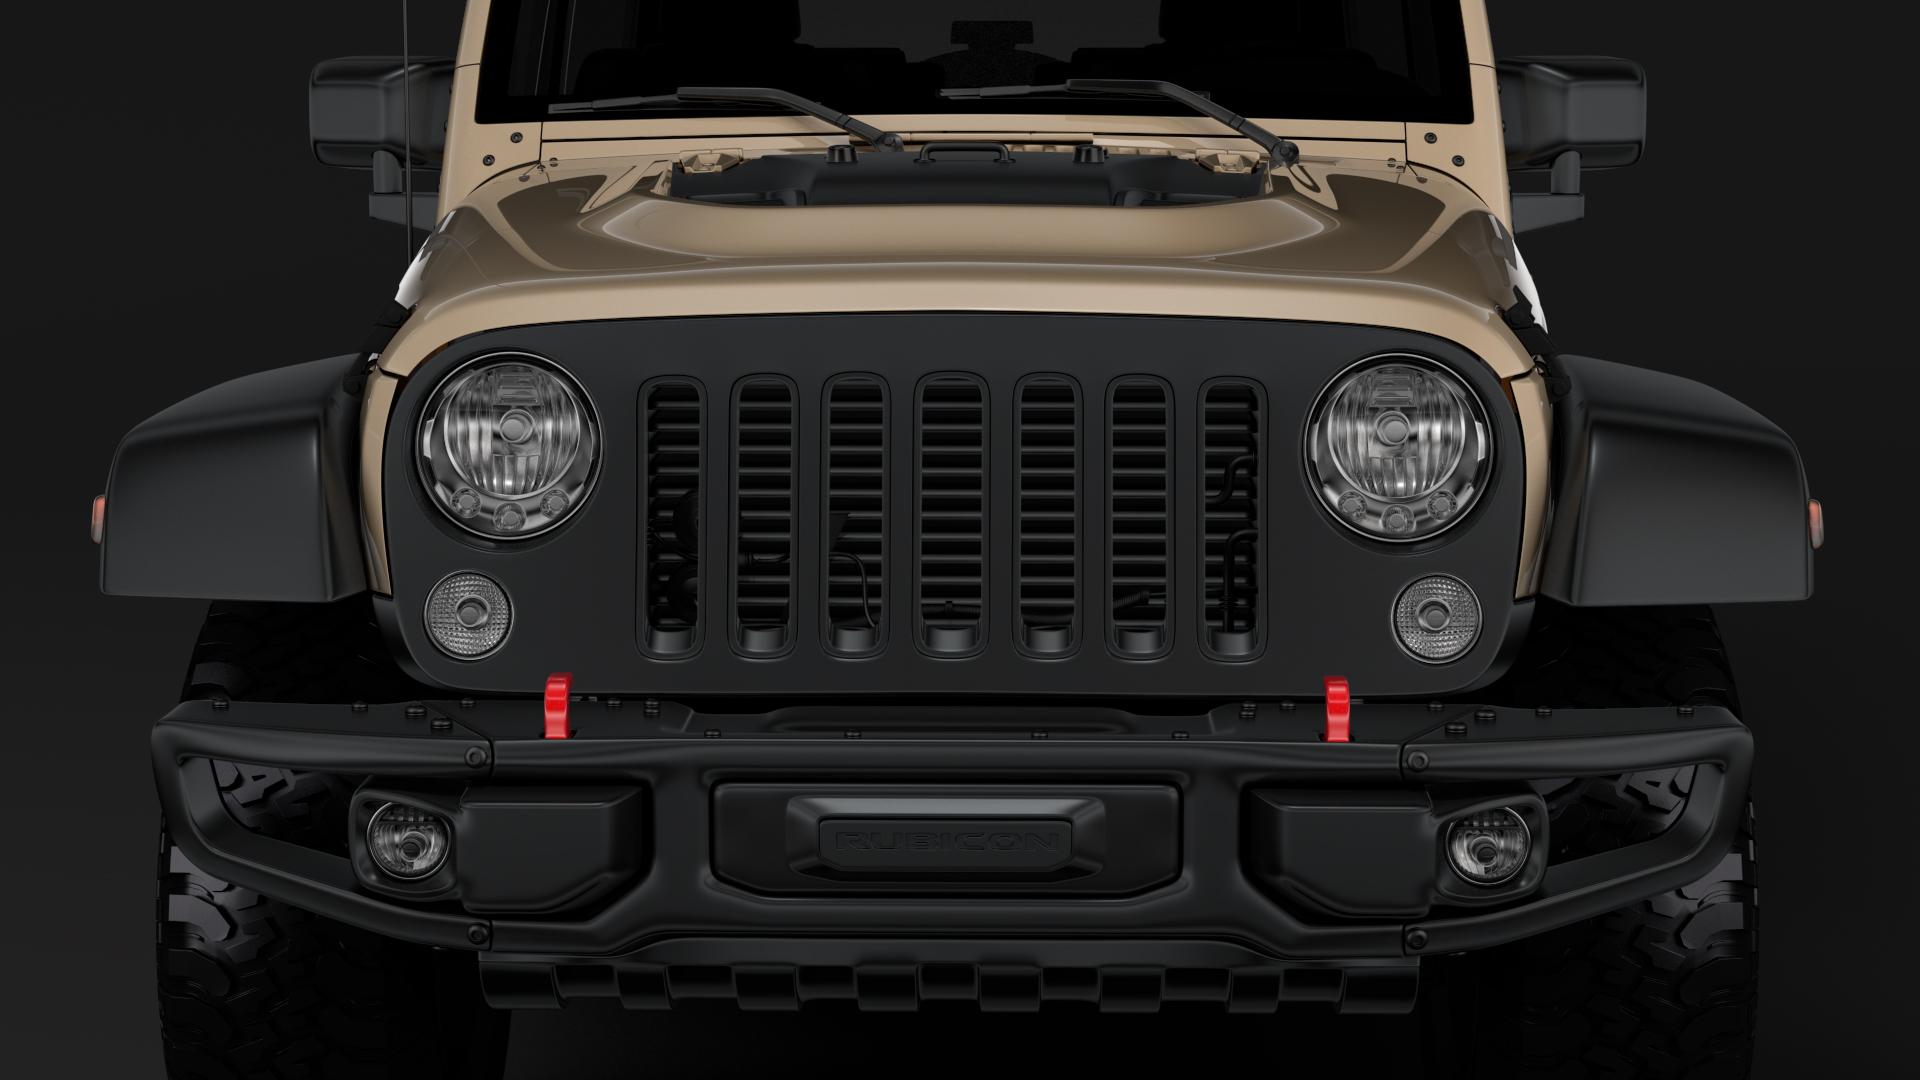 jeep wrangler rubicon recon jk 2017 3d model max fbx lwo ma mb hrc xsi obj 276942